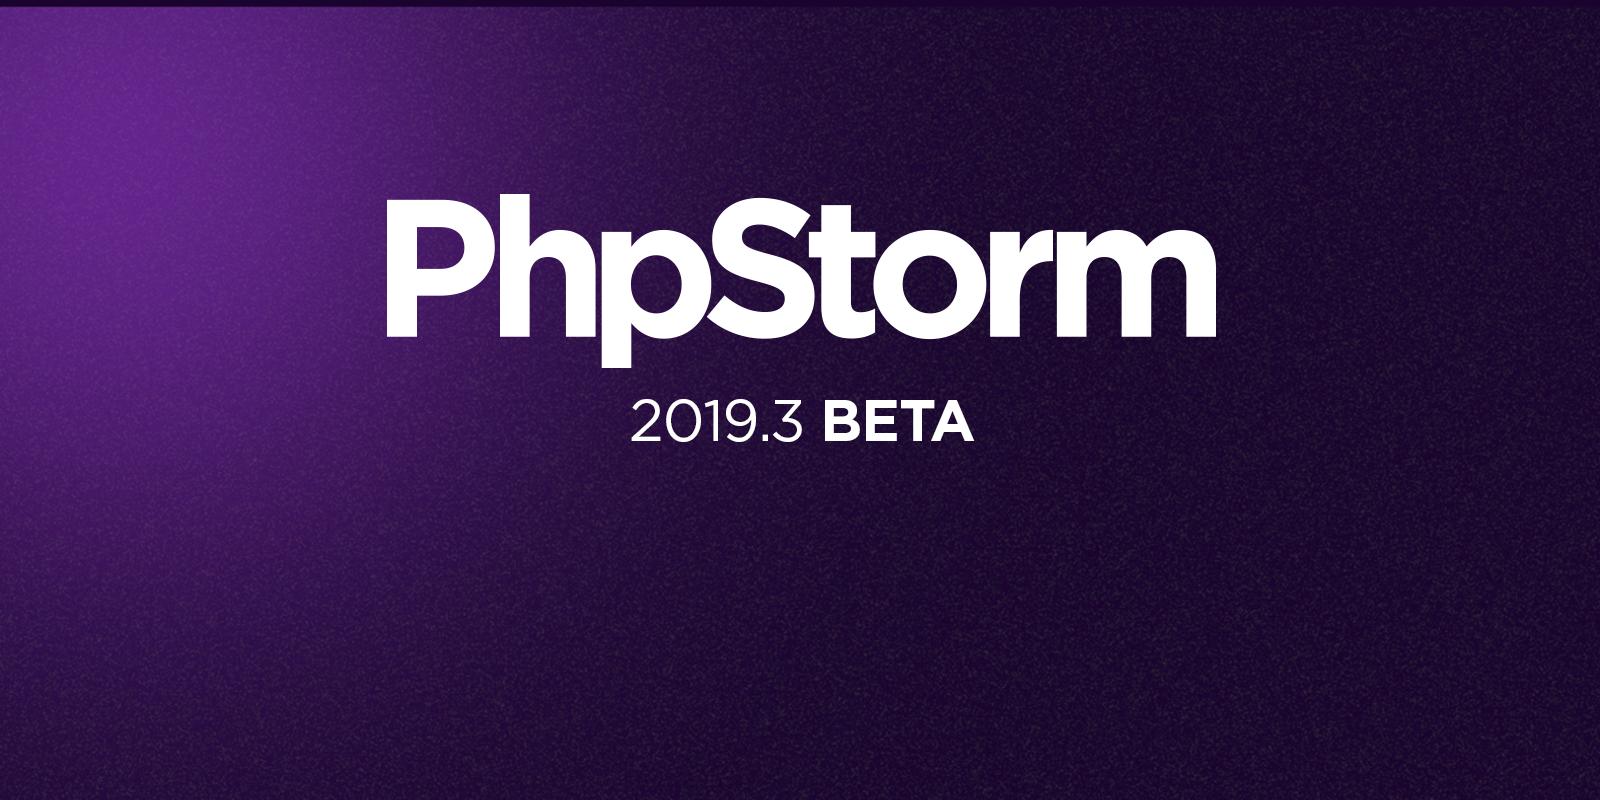 PhpStorm 2019.3 Beta